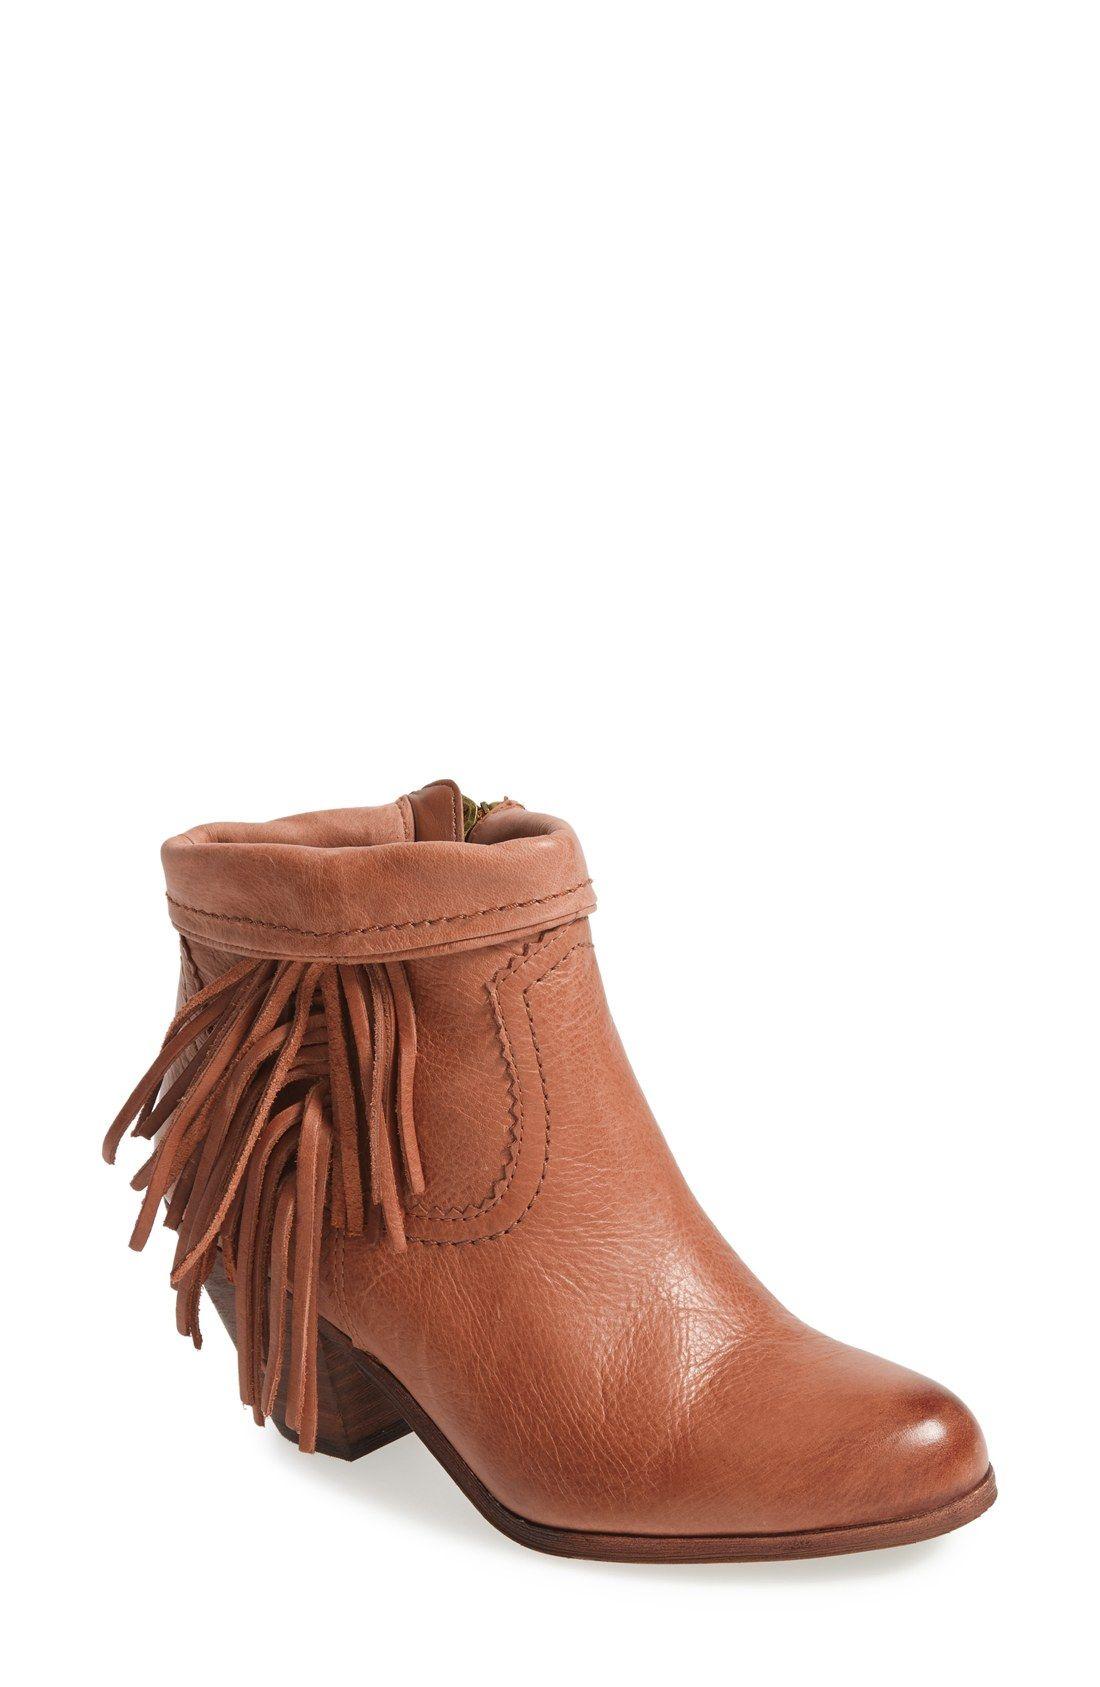 01c4514f1ce8e6 Sam Edelman  Louie  Boot - deep saddle leather - size 6